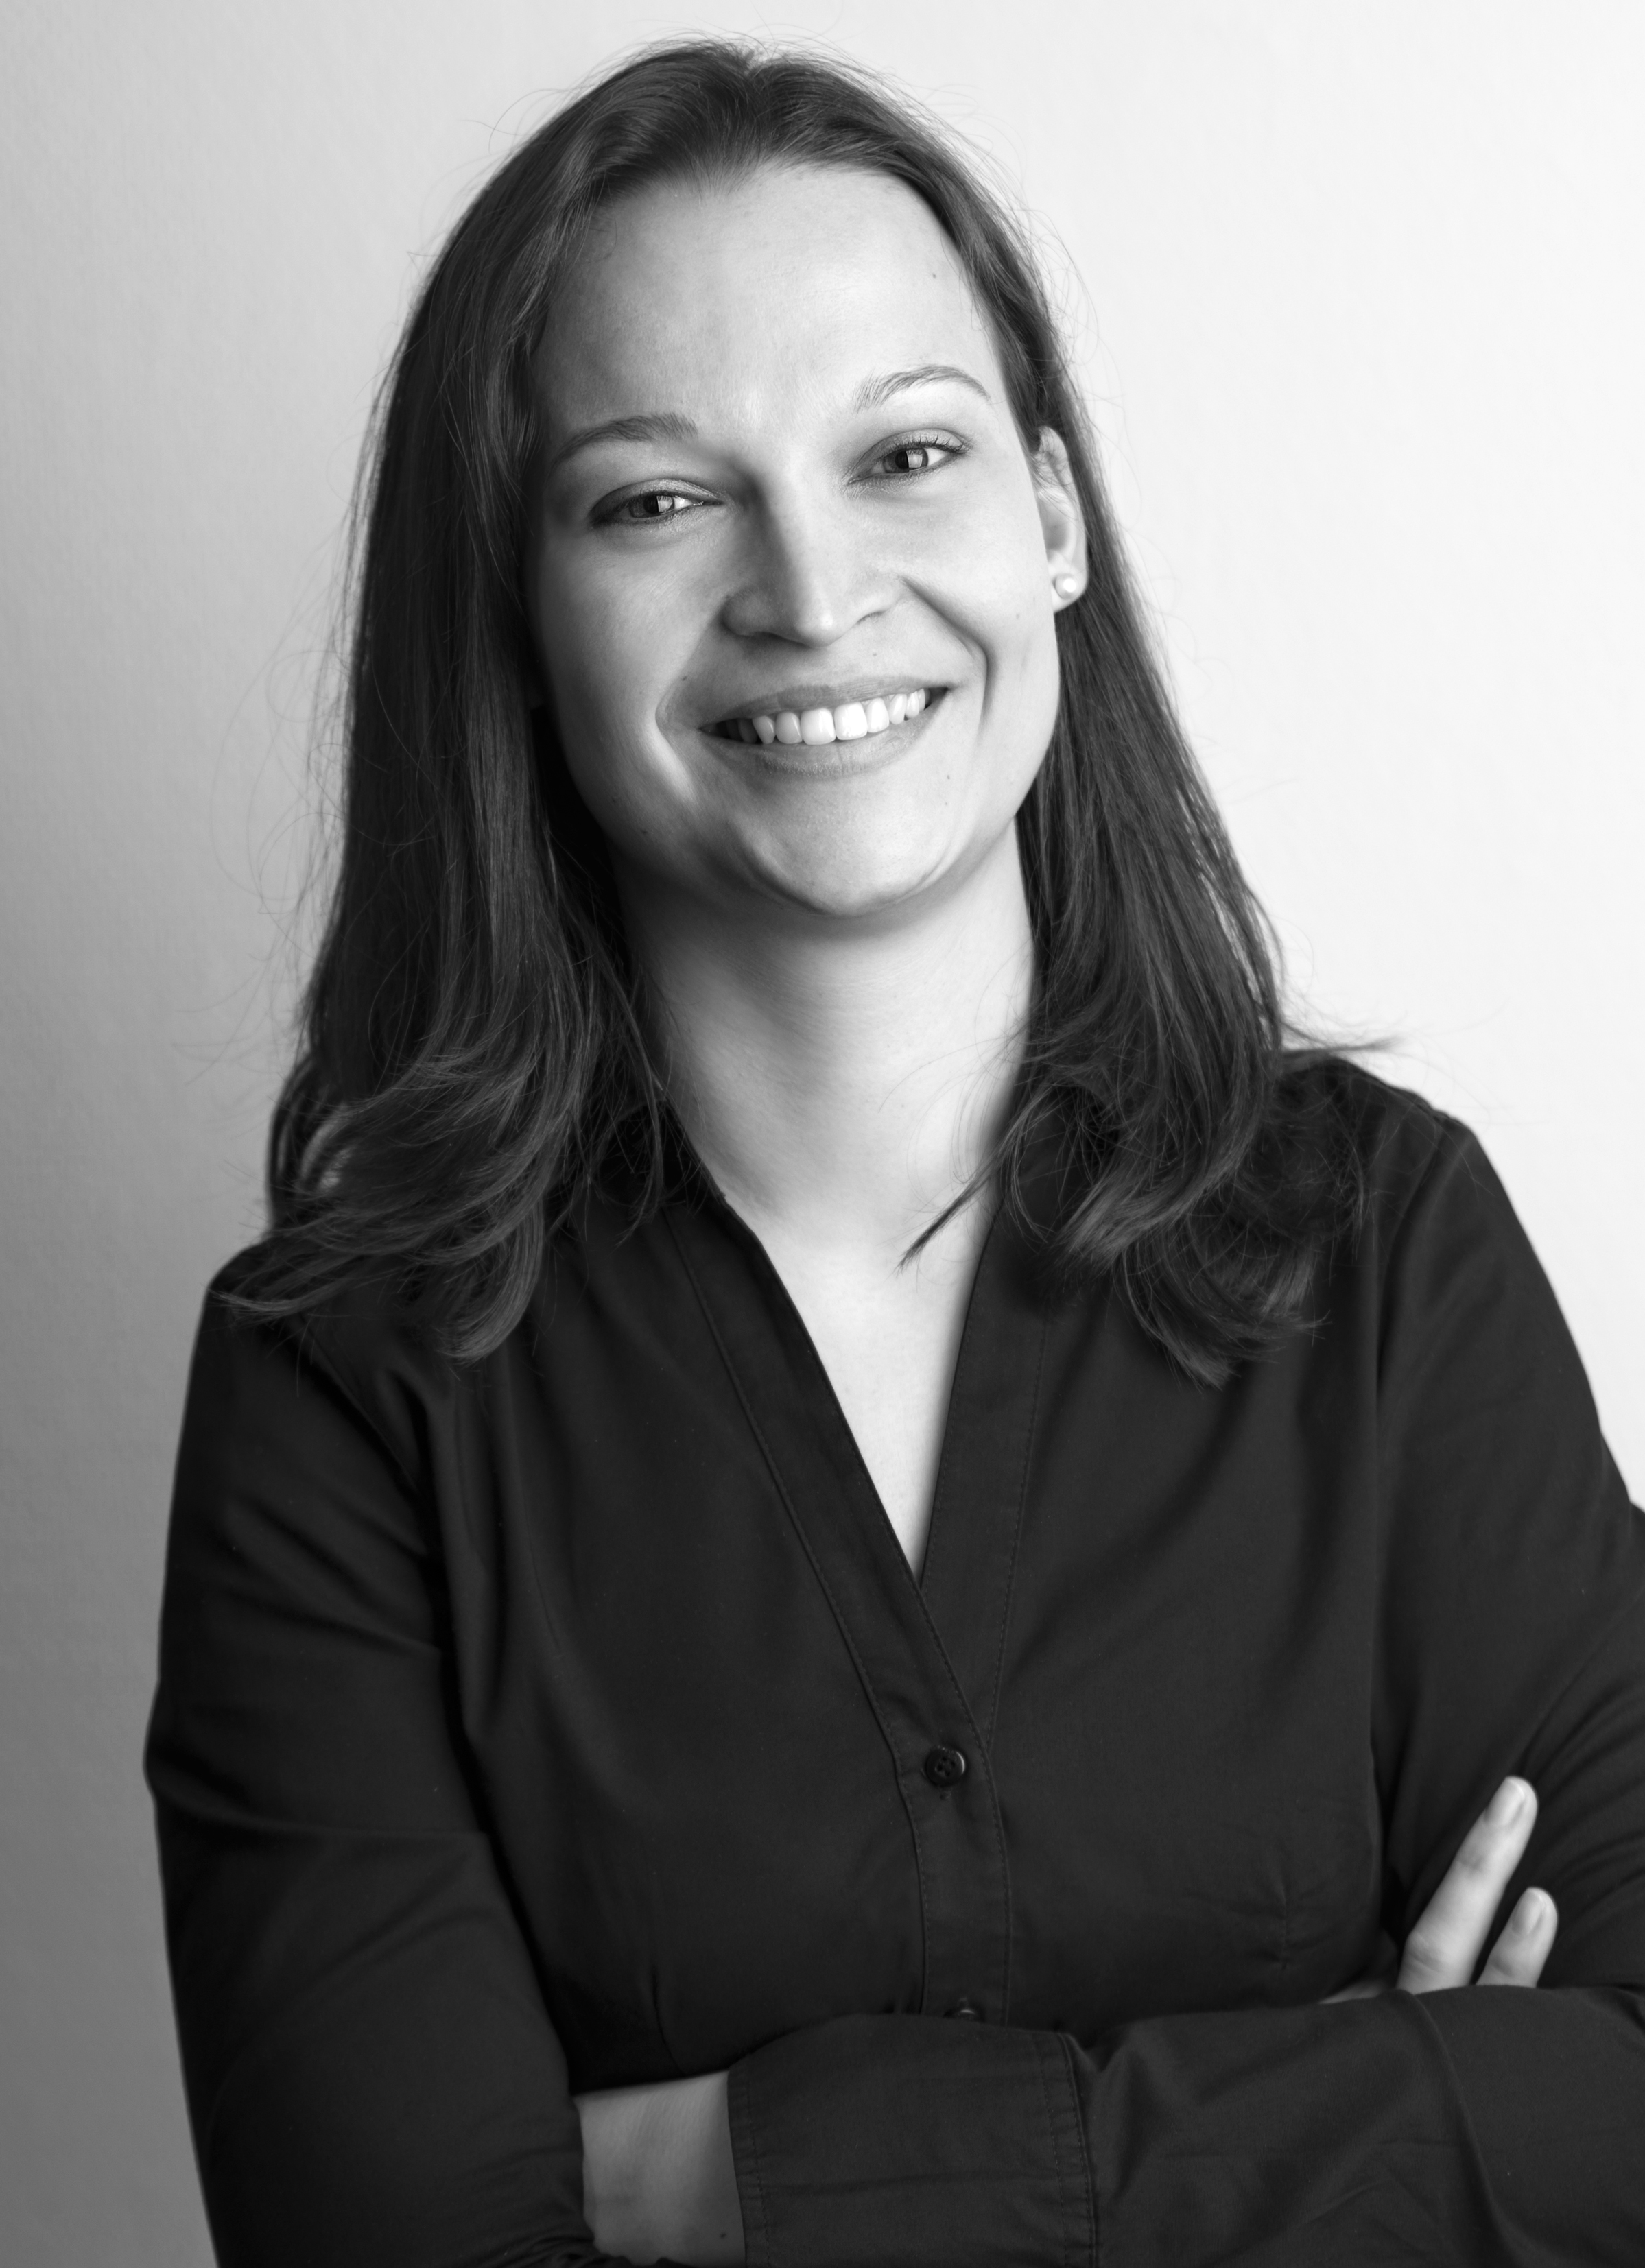 Theresa Hess